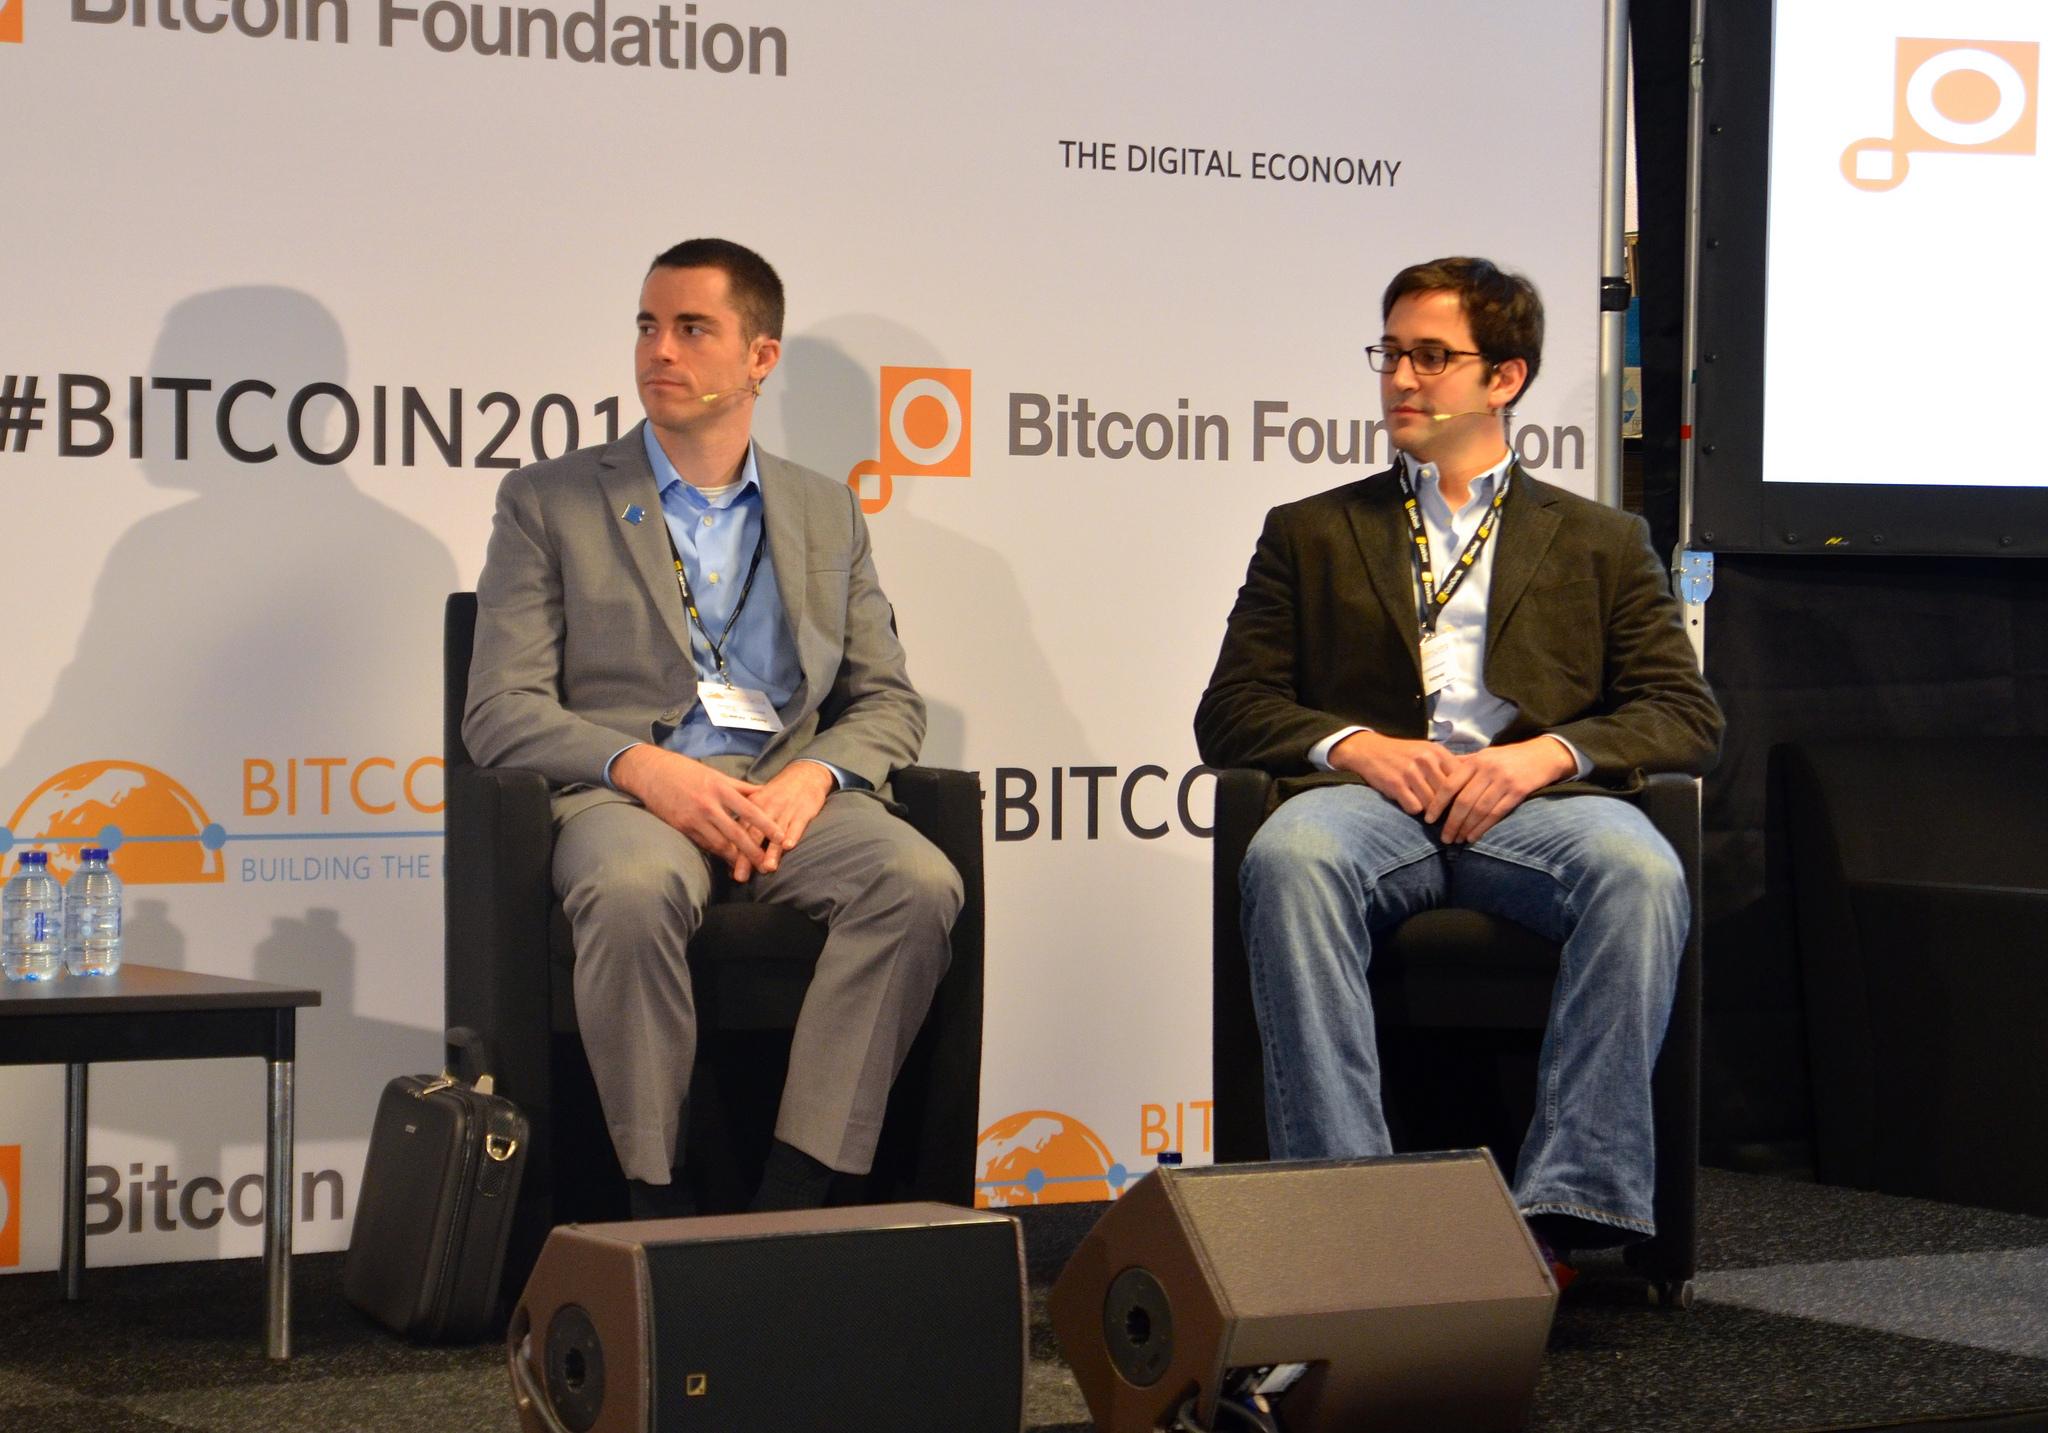 londoni bitcoin konferencia Roger Verrel